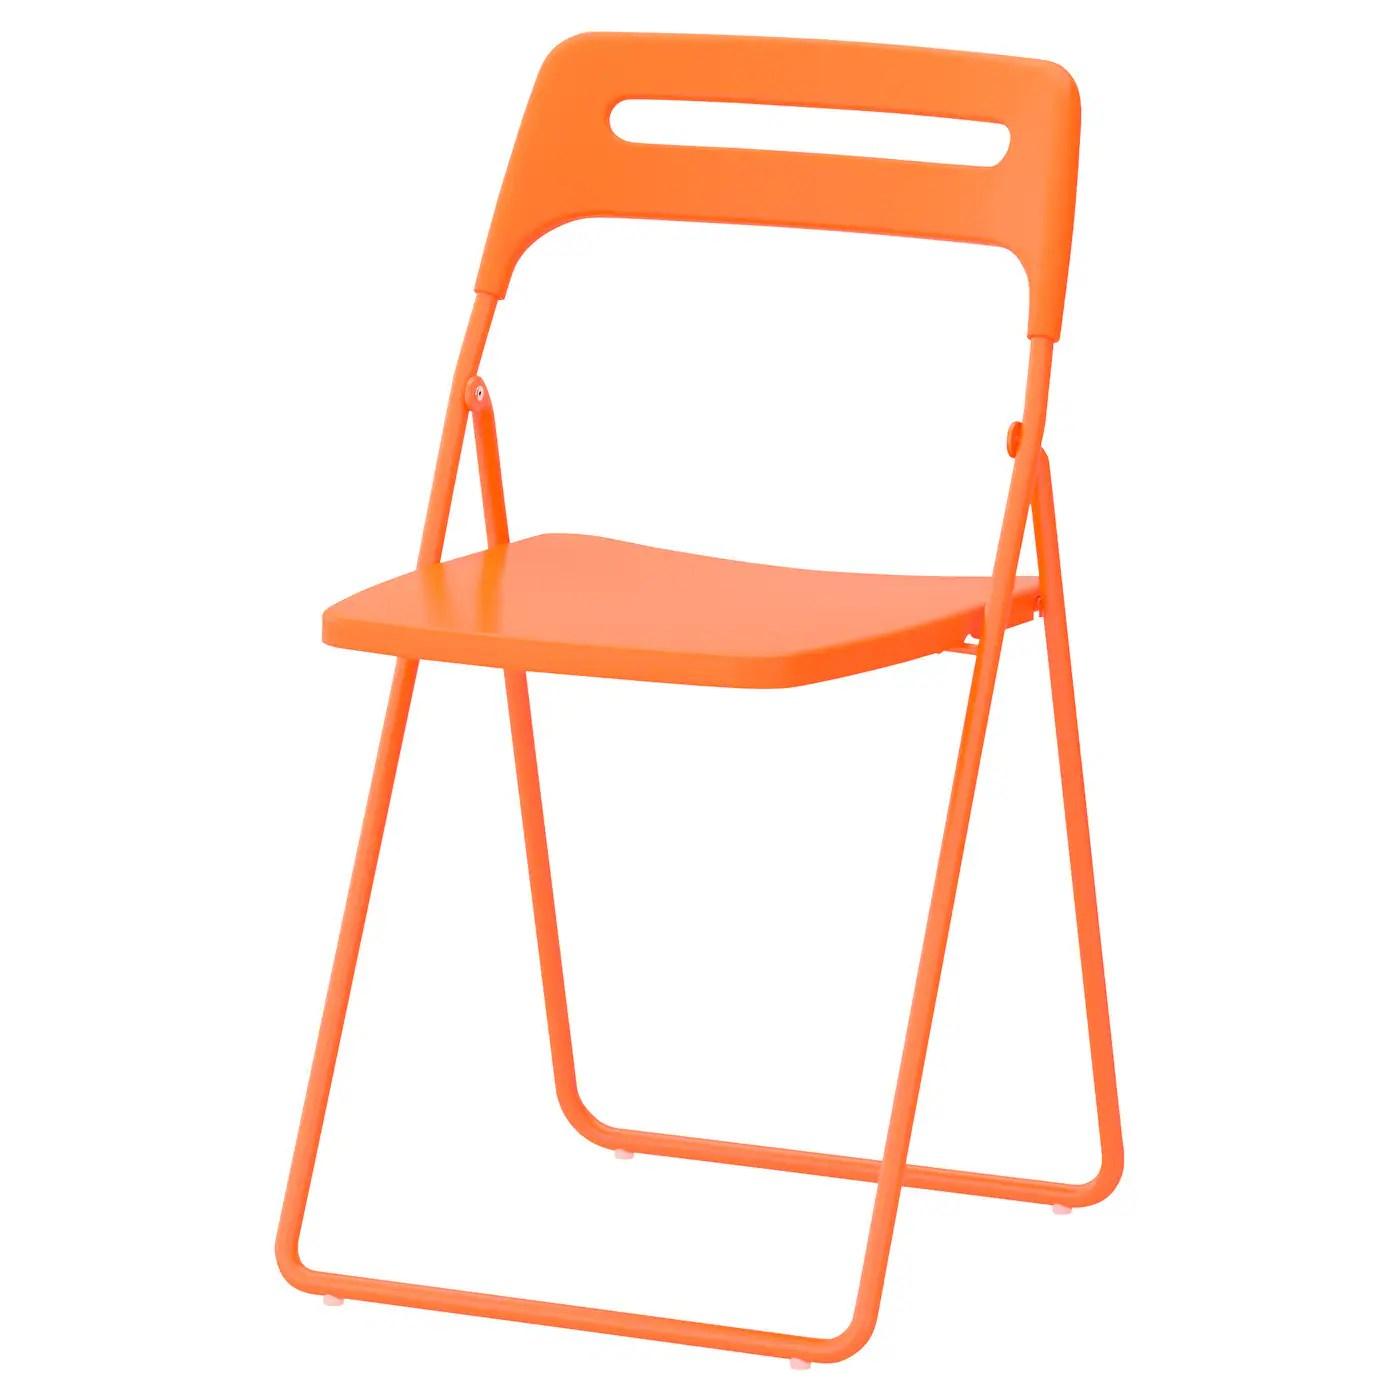 ikea foldable chairs wood doll high chair nisse folding orange